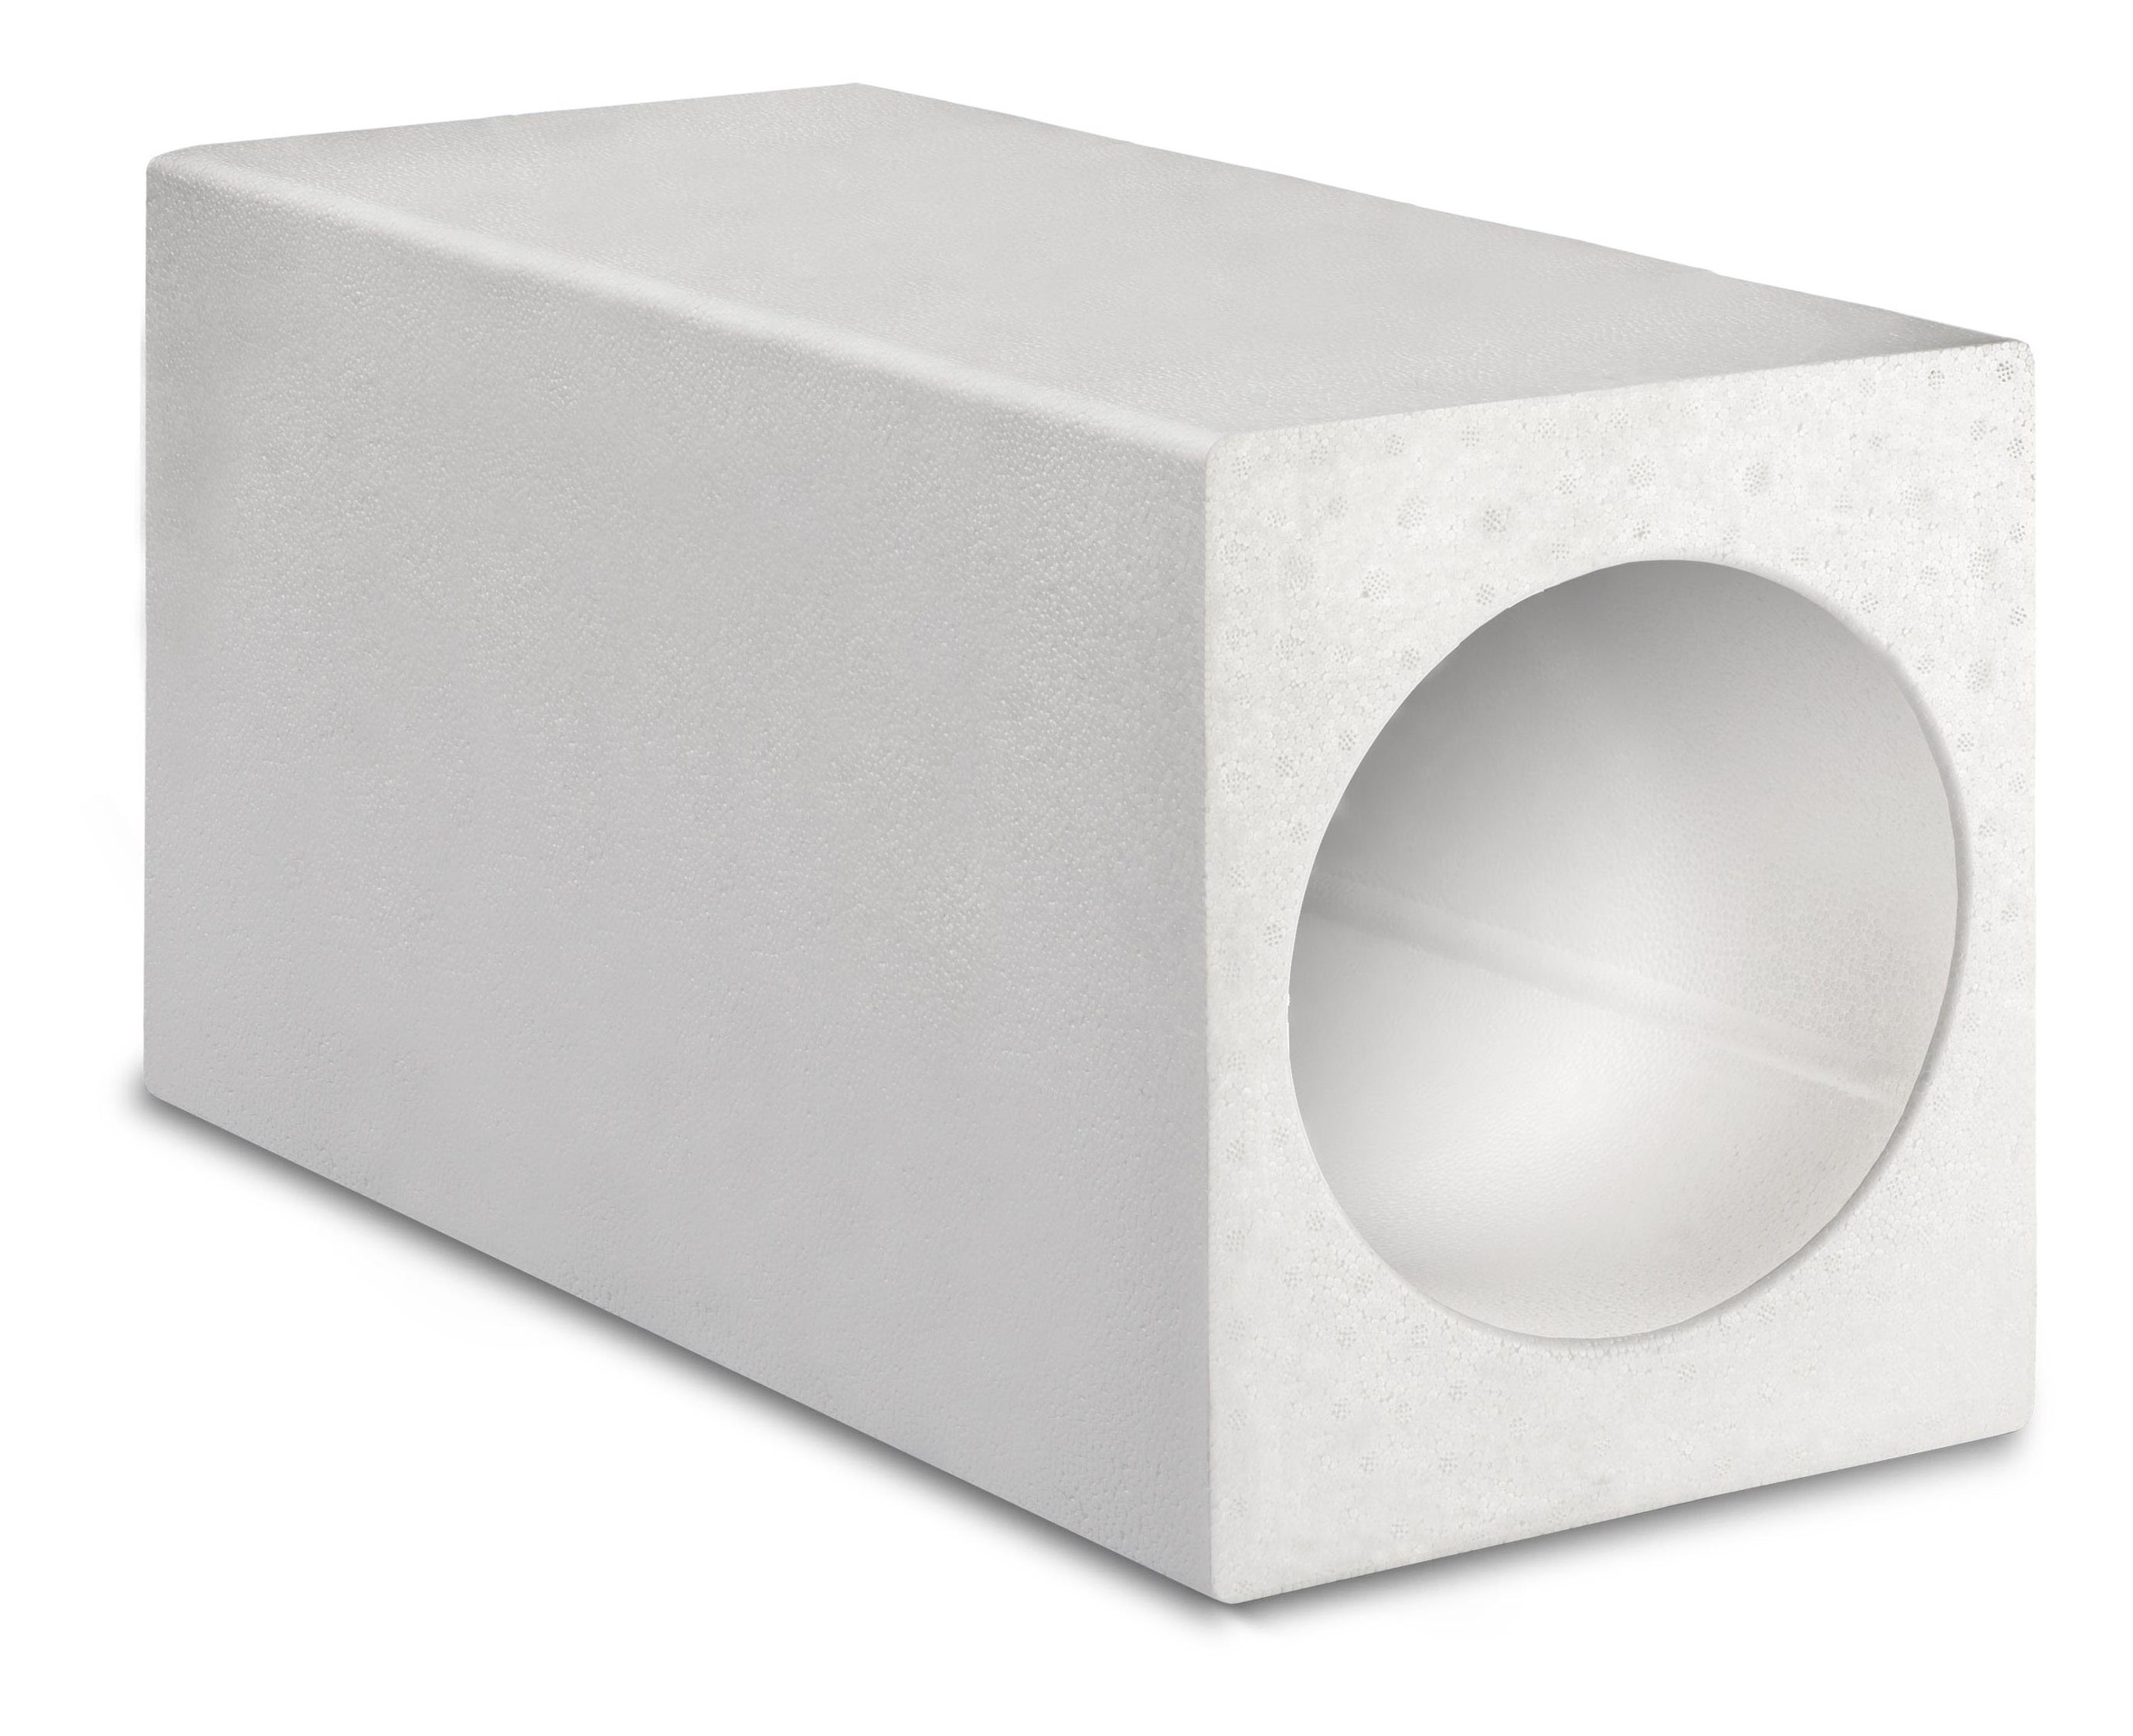 lunos wandeinbaugeh use mit gef lle h240xb210xt500mm eps. Black Bedroom Furniture Sets. Home Design Ideas